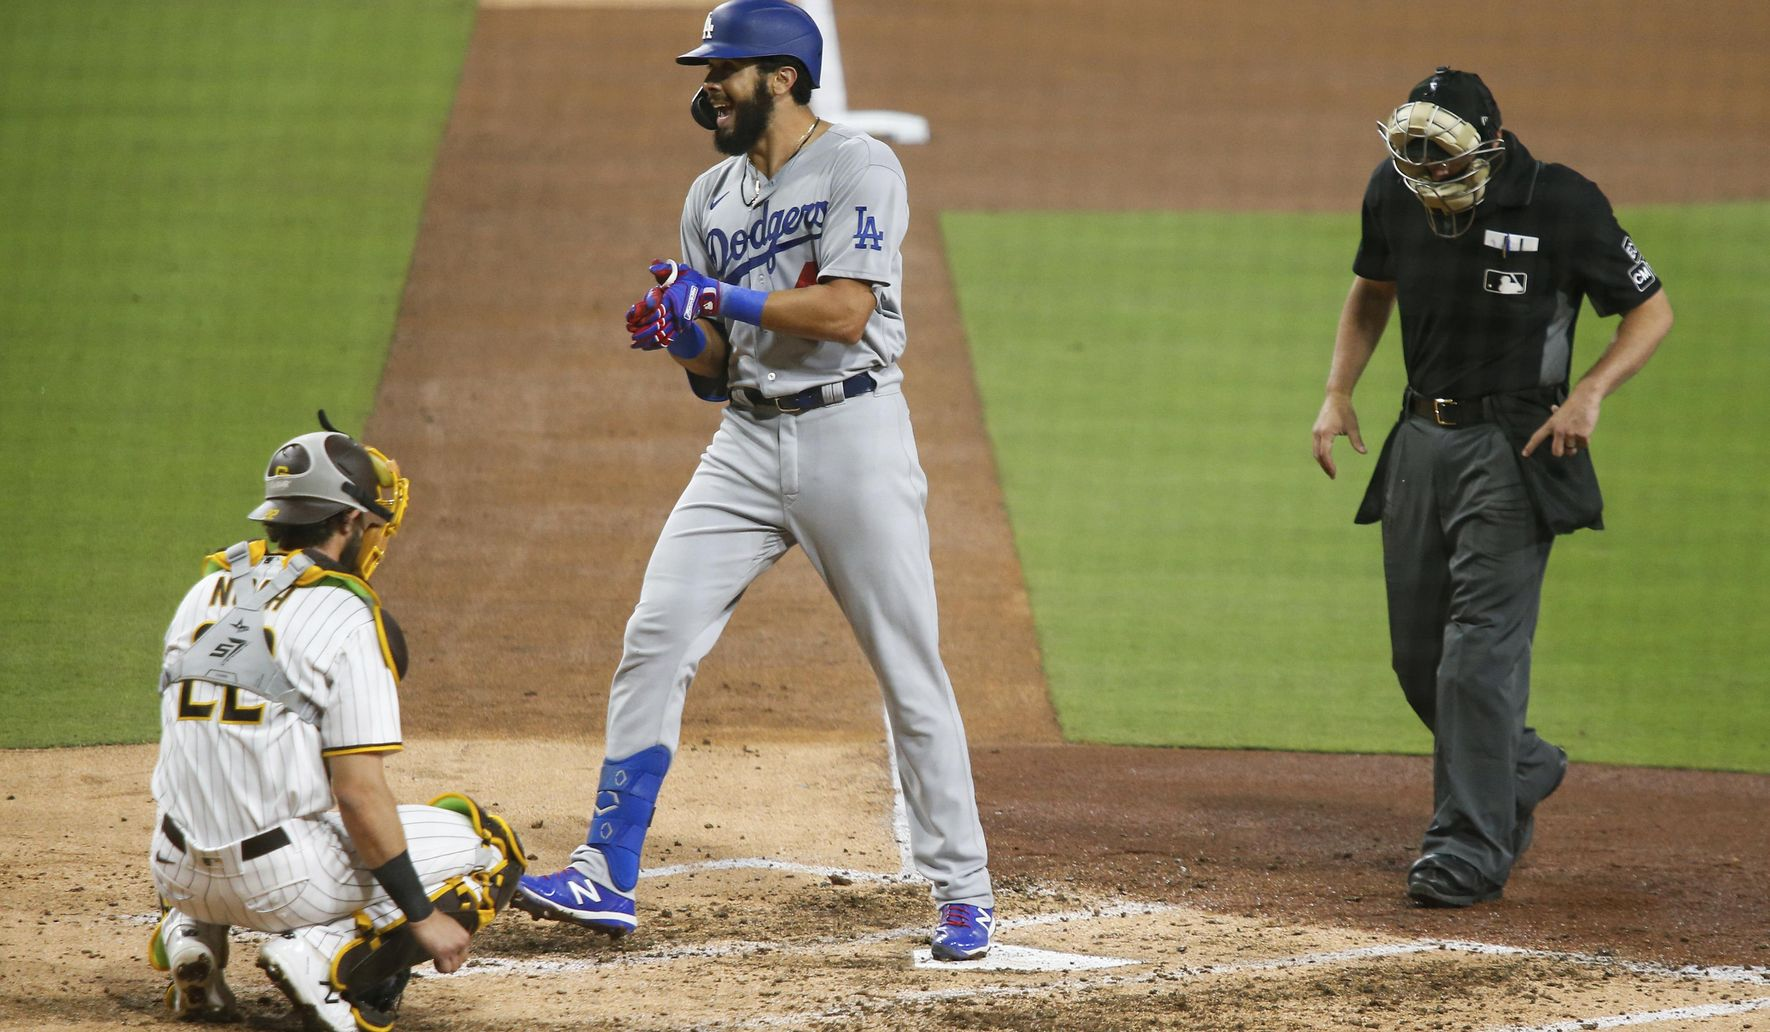 Dodgers_padres_baseball_59191_c0-177-4231-2643_s1770x1032